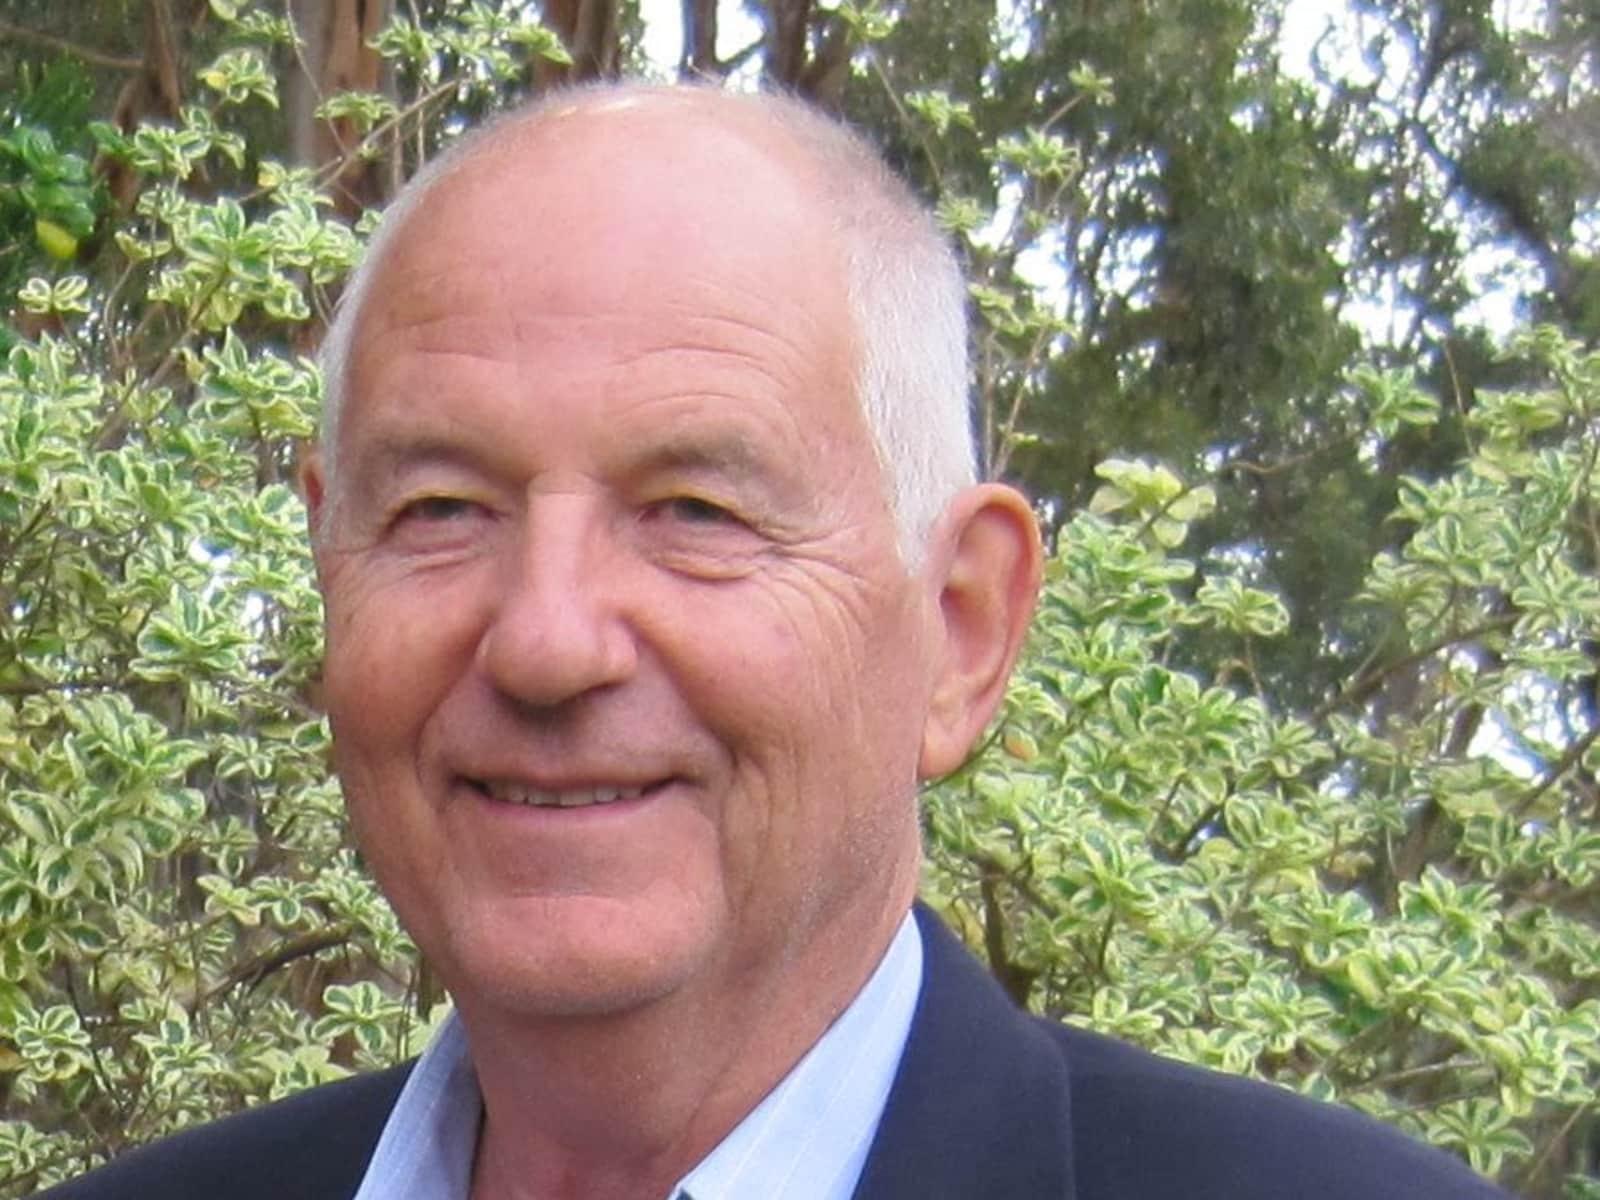 James from Toodyay, Western Australia, Australia